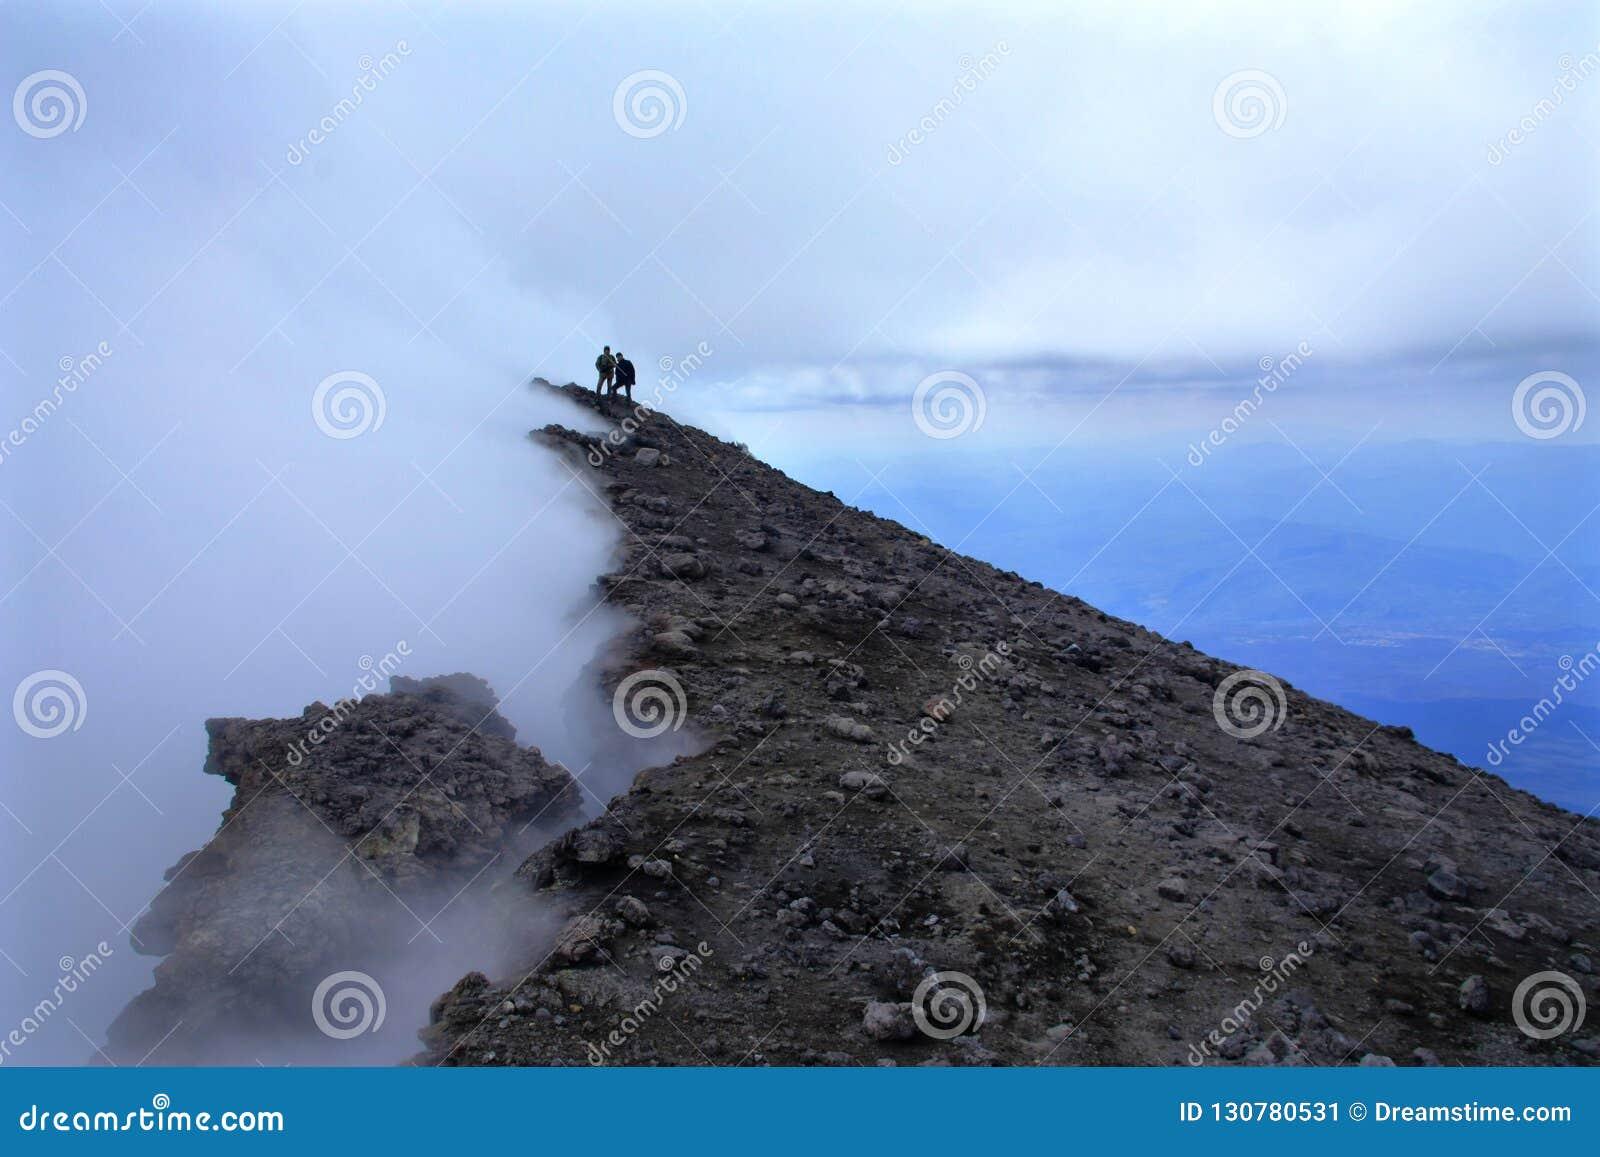 Mungibeddu aka Mt. Etna is the highest european volcano.